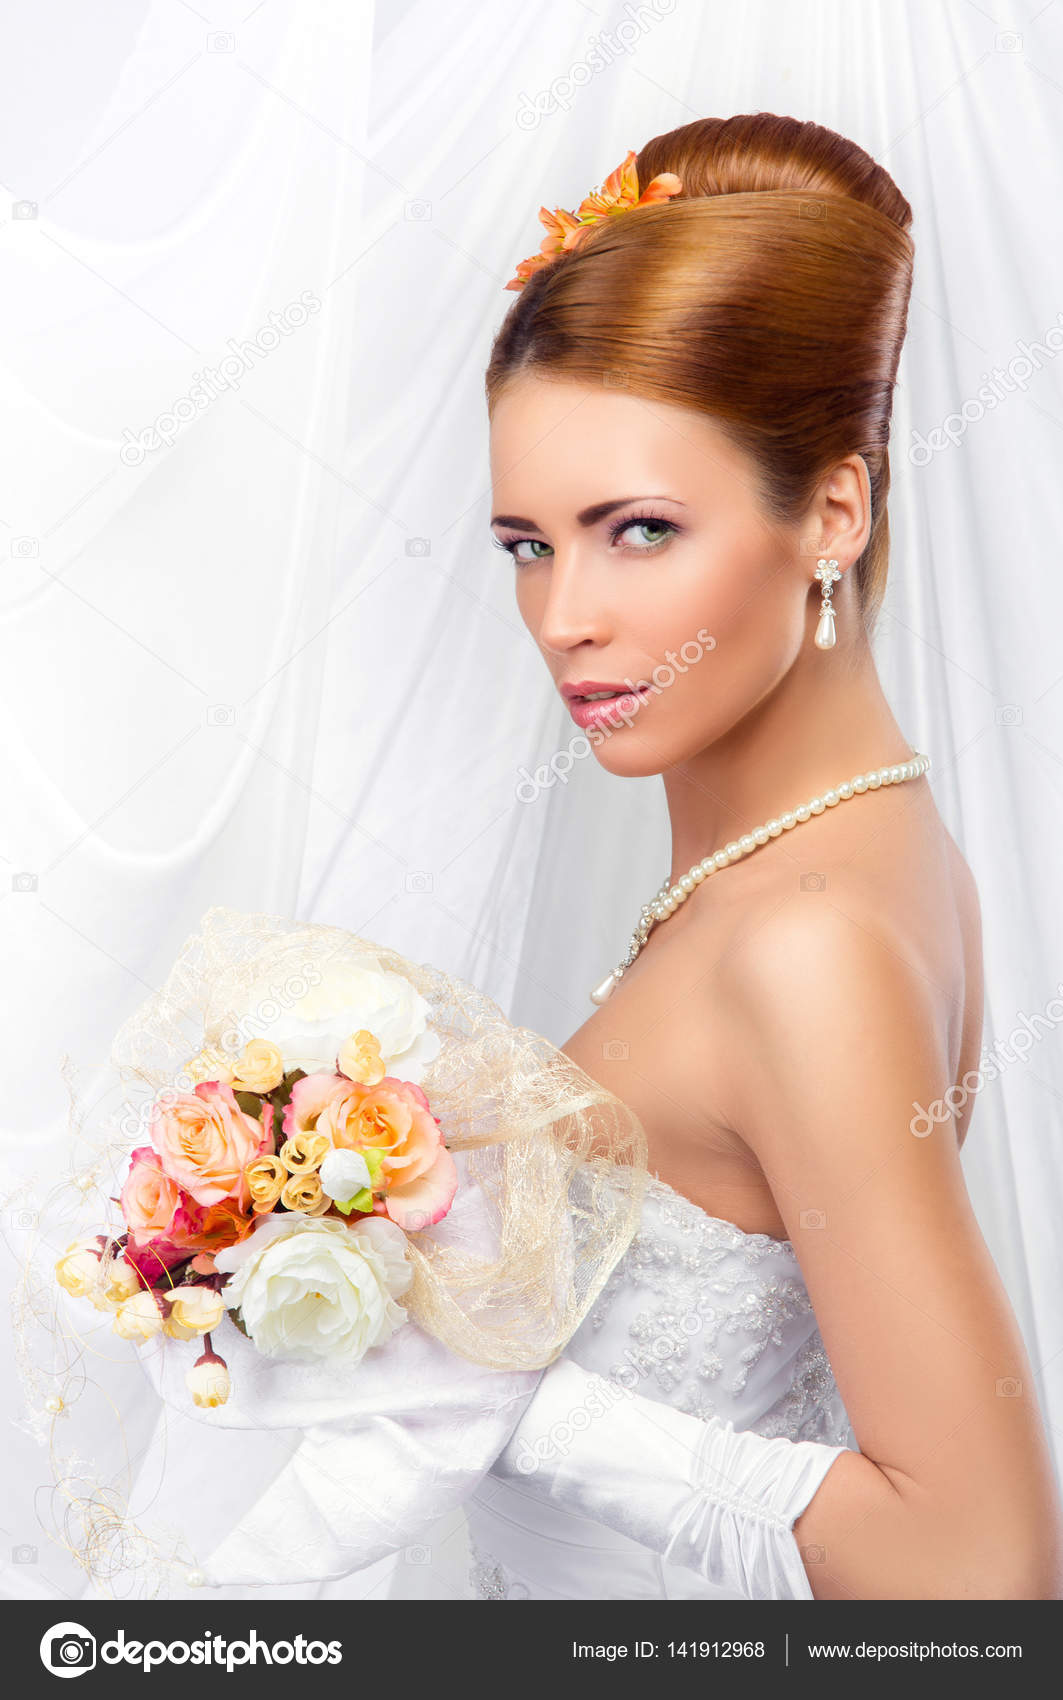 schöne Braut im Hochzeitskleid — Stockfoto © shmeljov #141912968